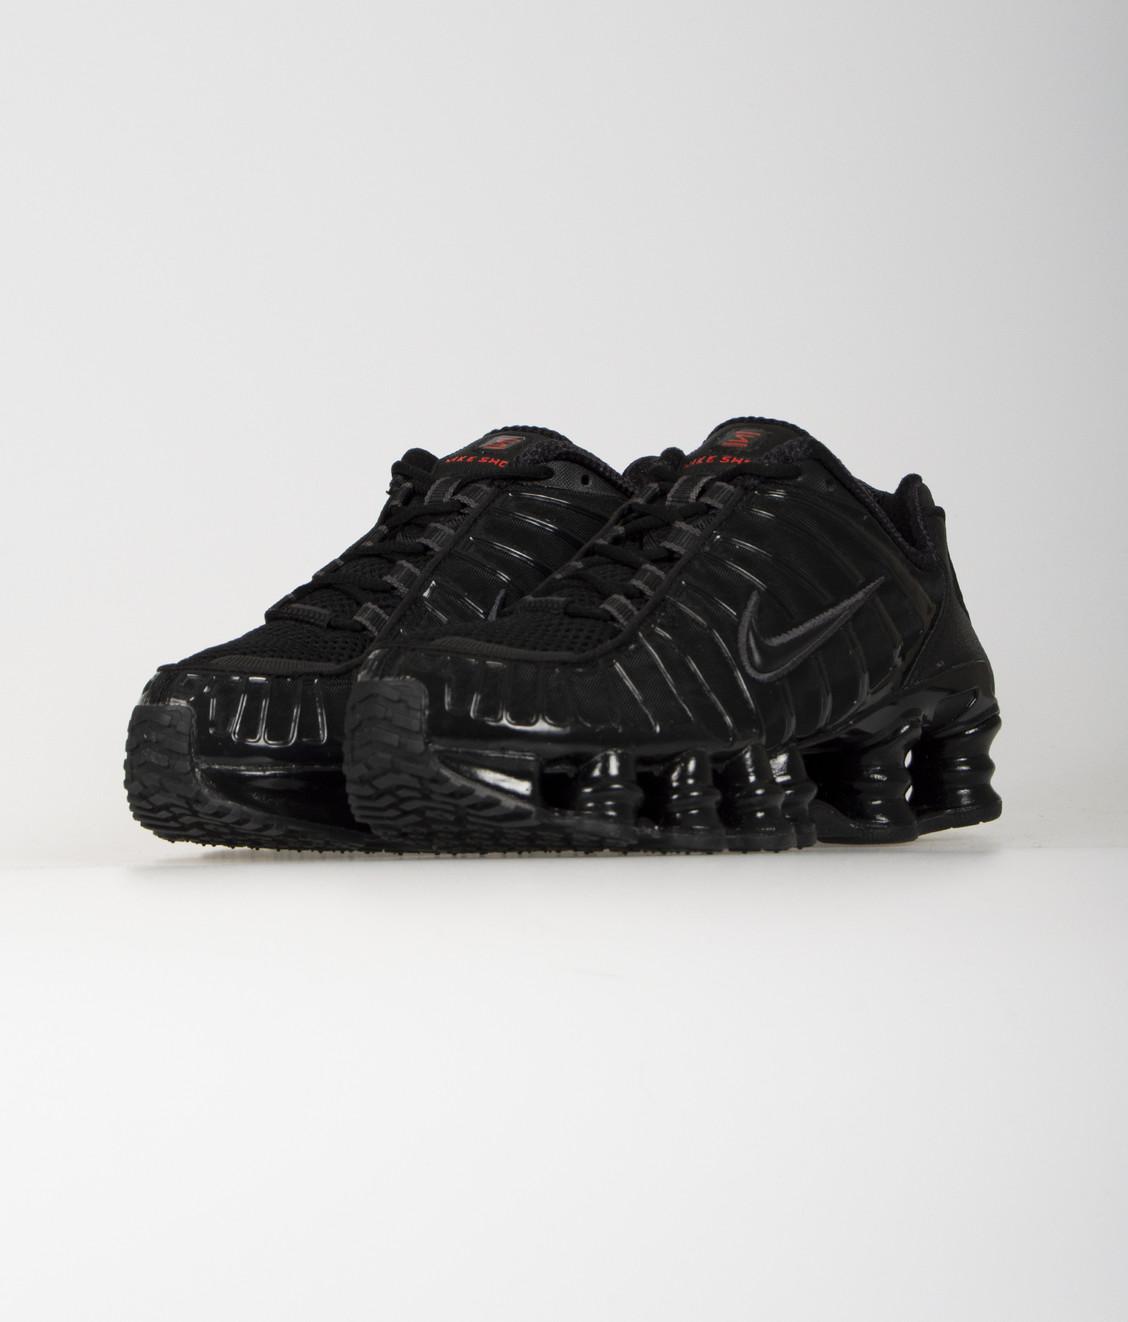 Nike Nike Shox TL Black Metallic Hematite